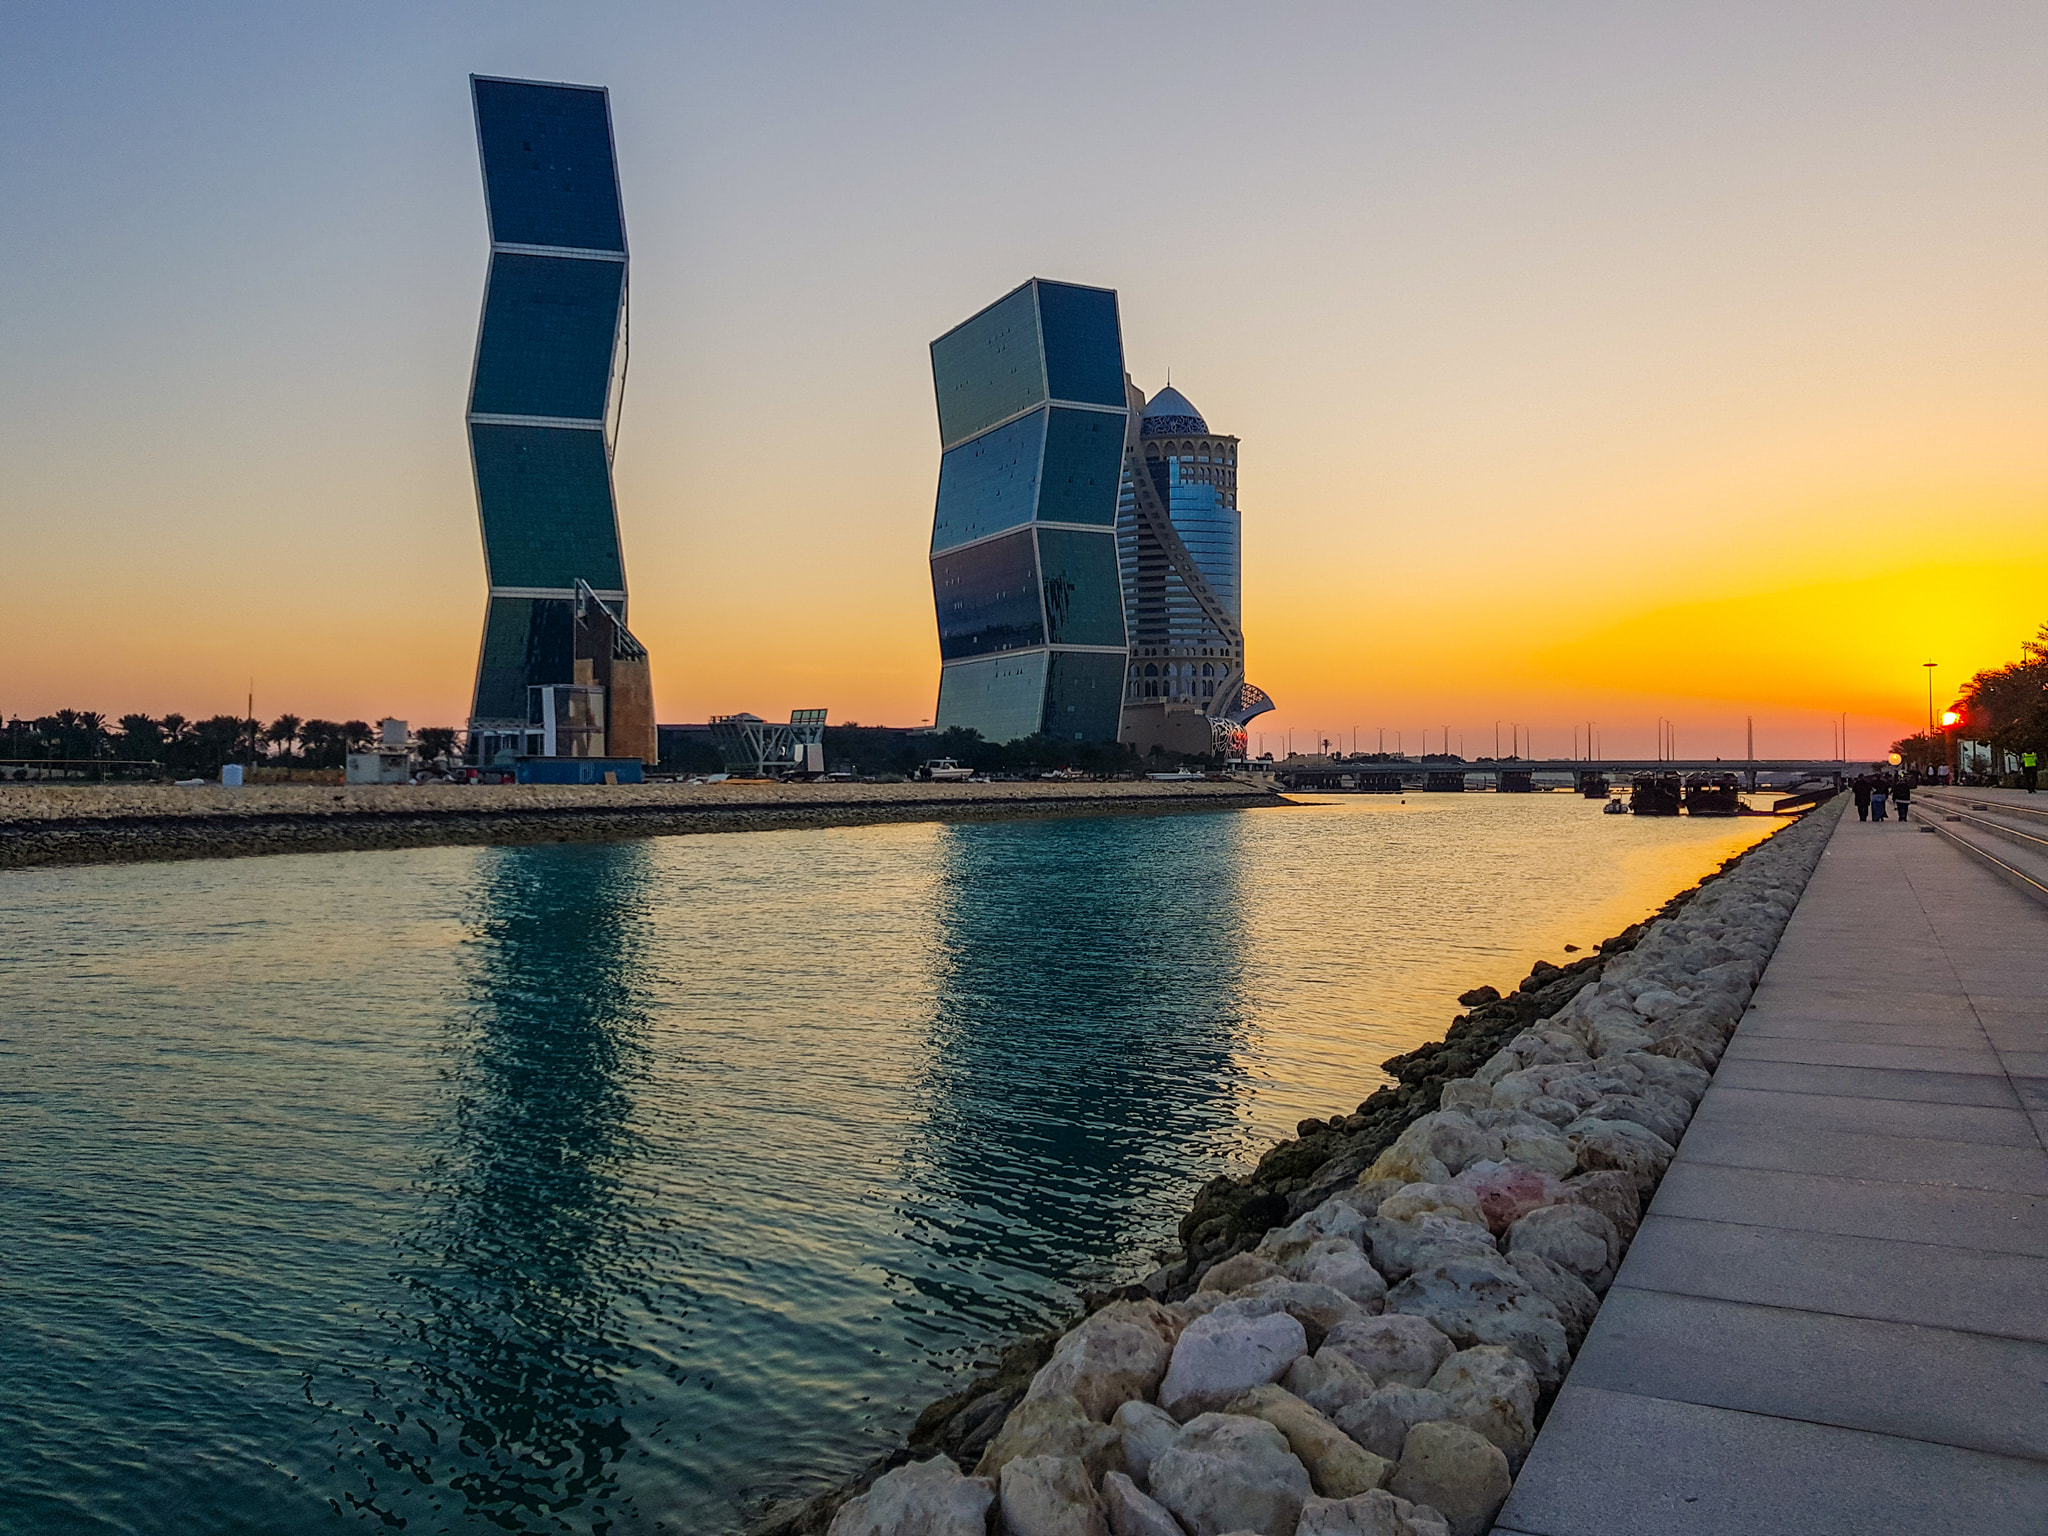 Sunset in Qatar